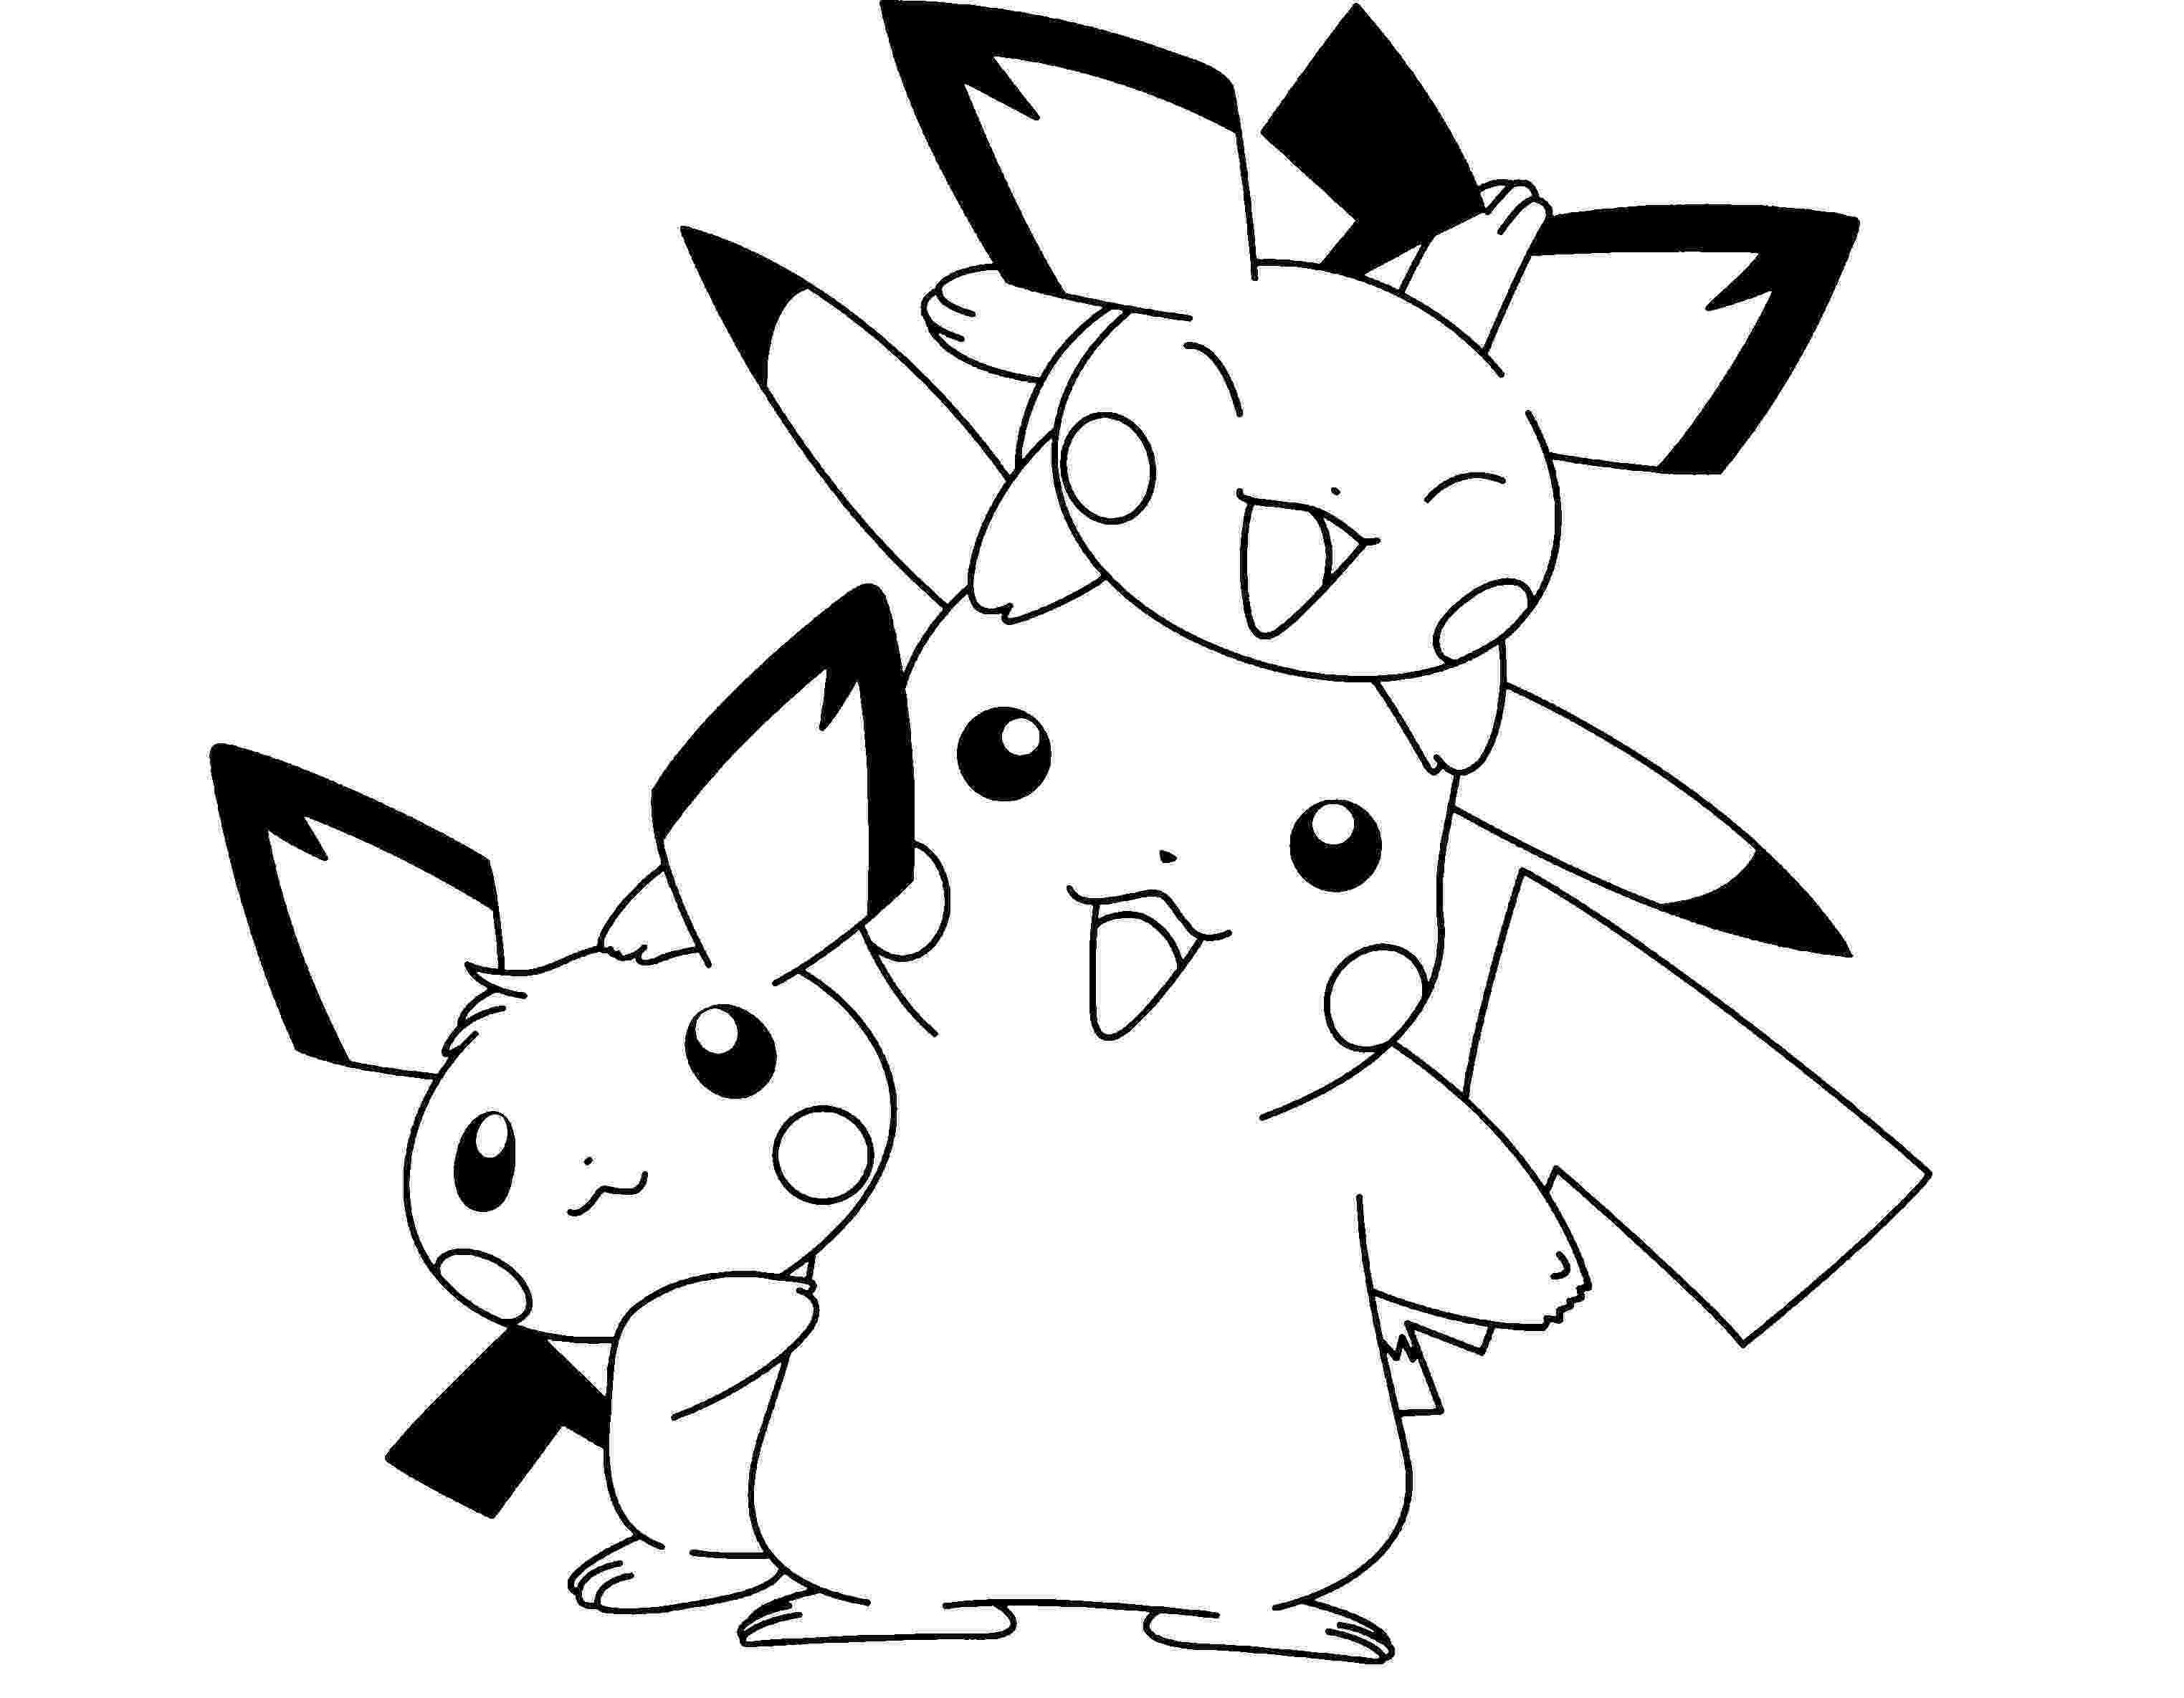 coloring pages pikachu free printable pikachu coloring pages for kids pages coloring pikachu